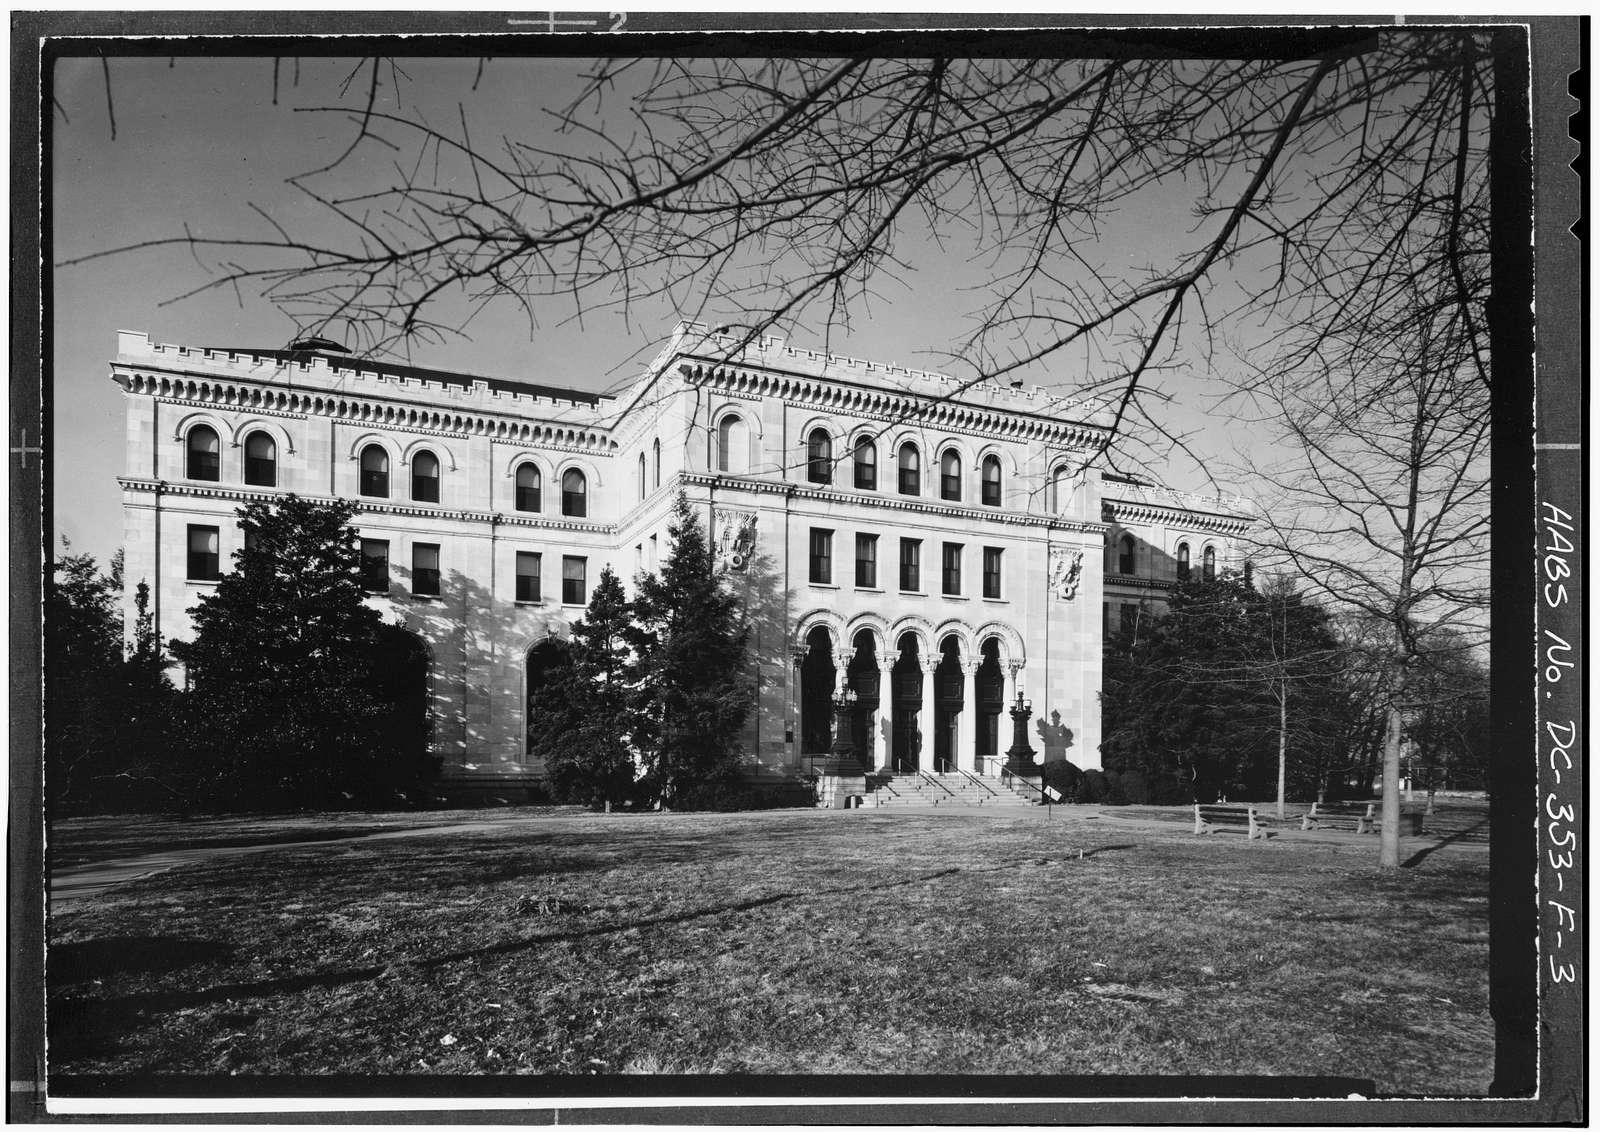 U.S. Soldiers Home, Grant Building, Rock Creek Church Road & Upshur Street Northwest, Washington, District of Columbia, DC